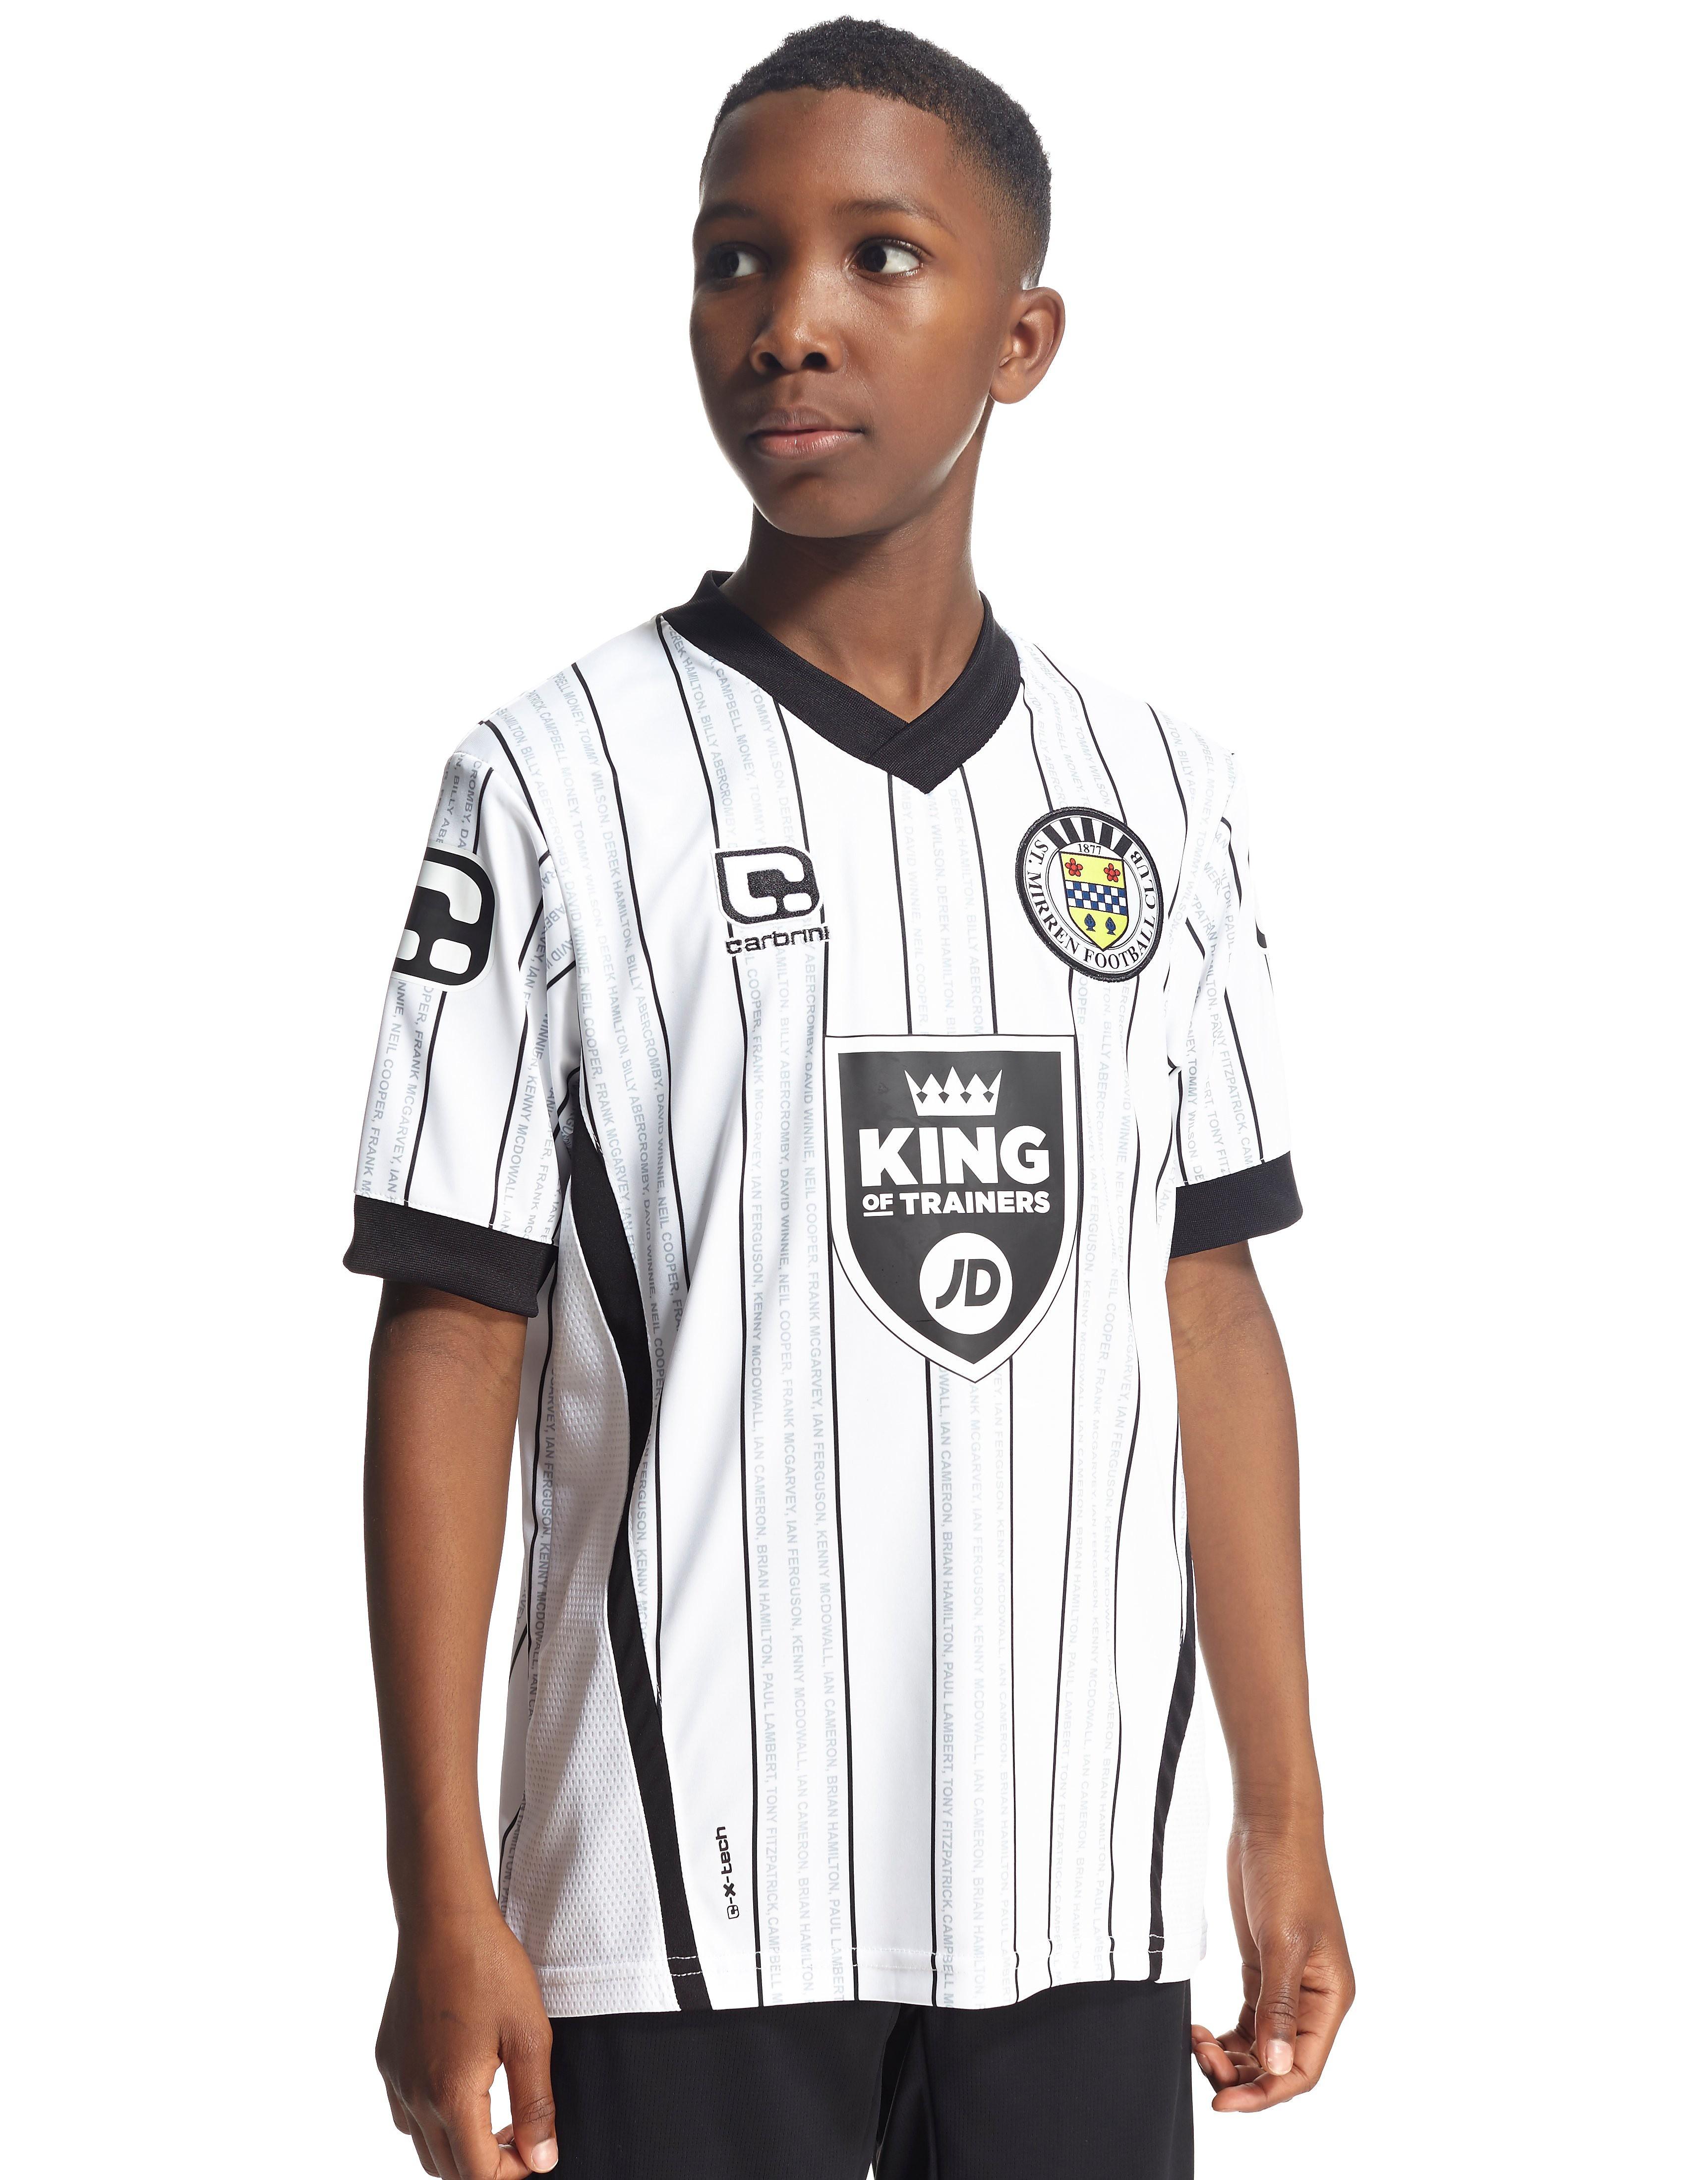 Carbrini St Mirren FC 2016/17 Home Shirt Junior